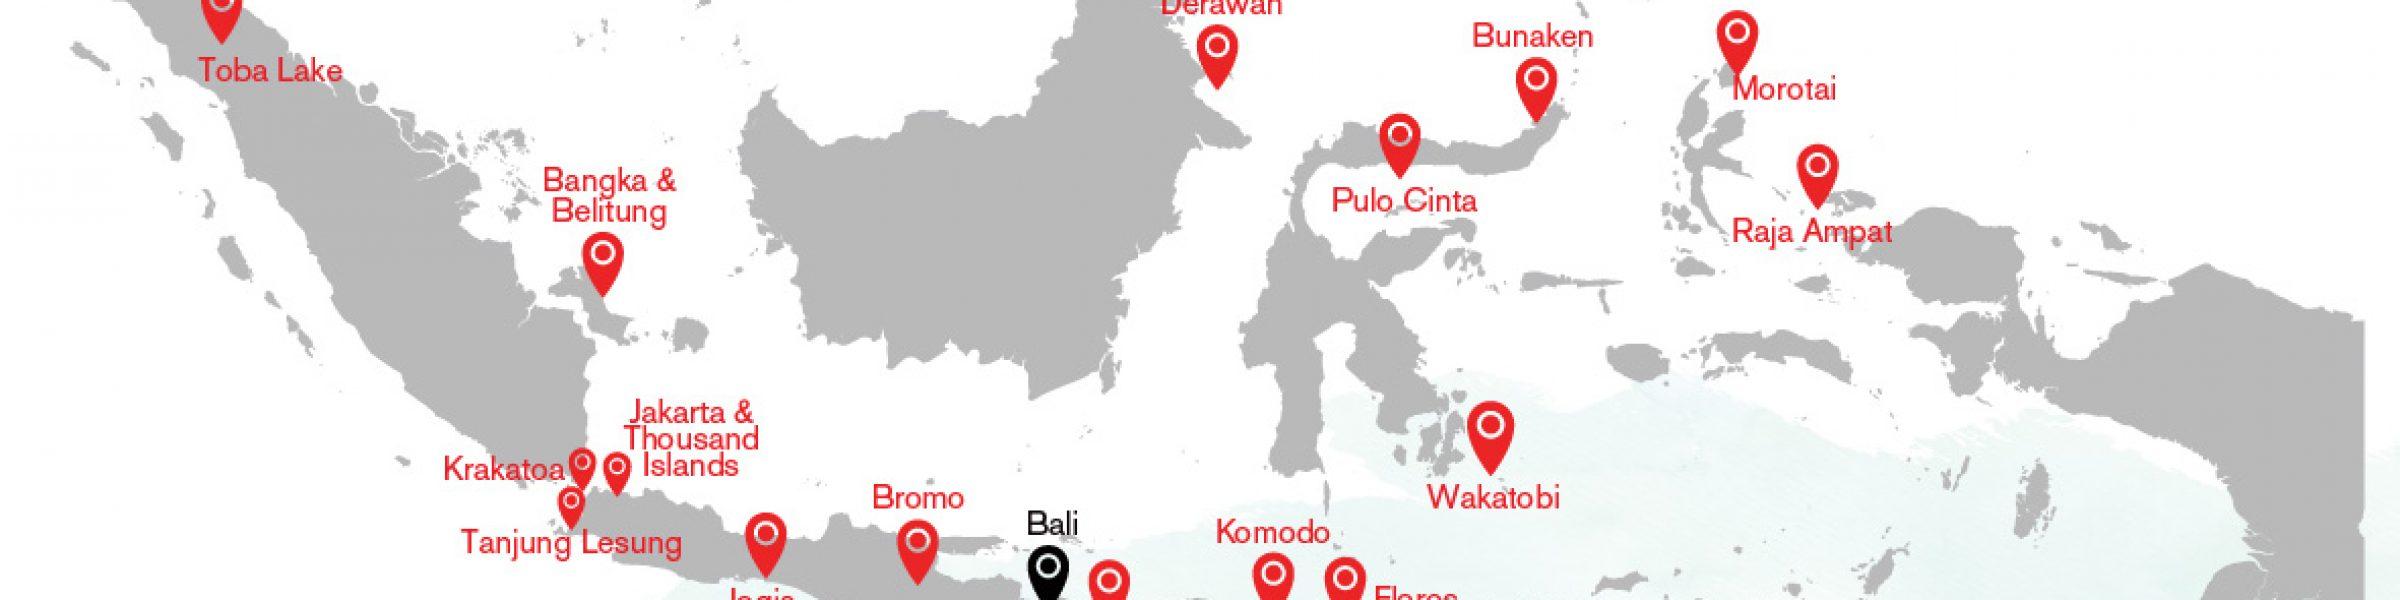 ten new Bali project